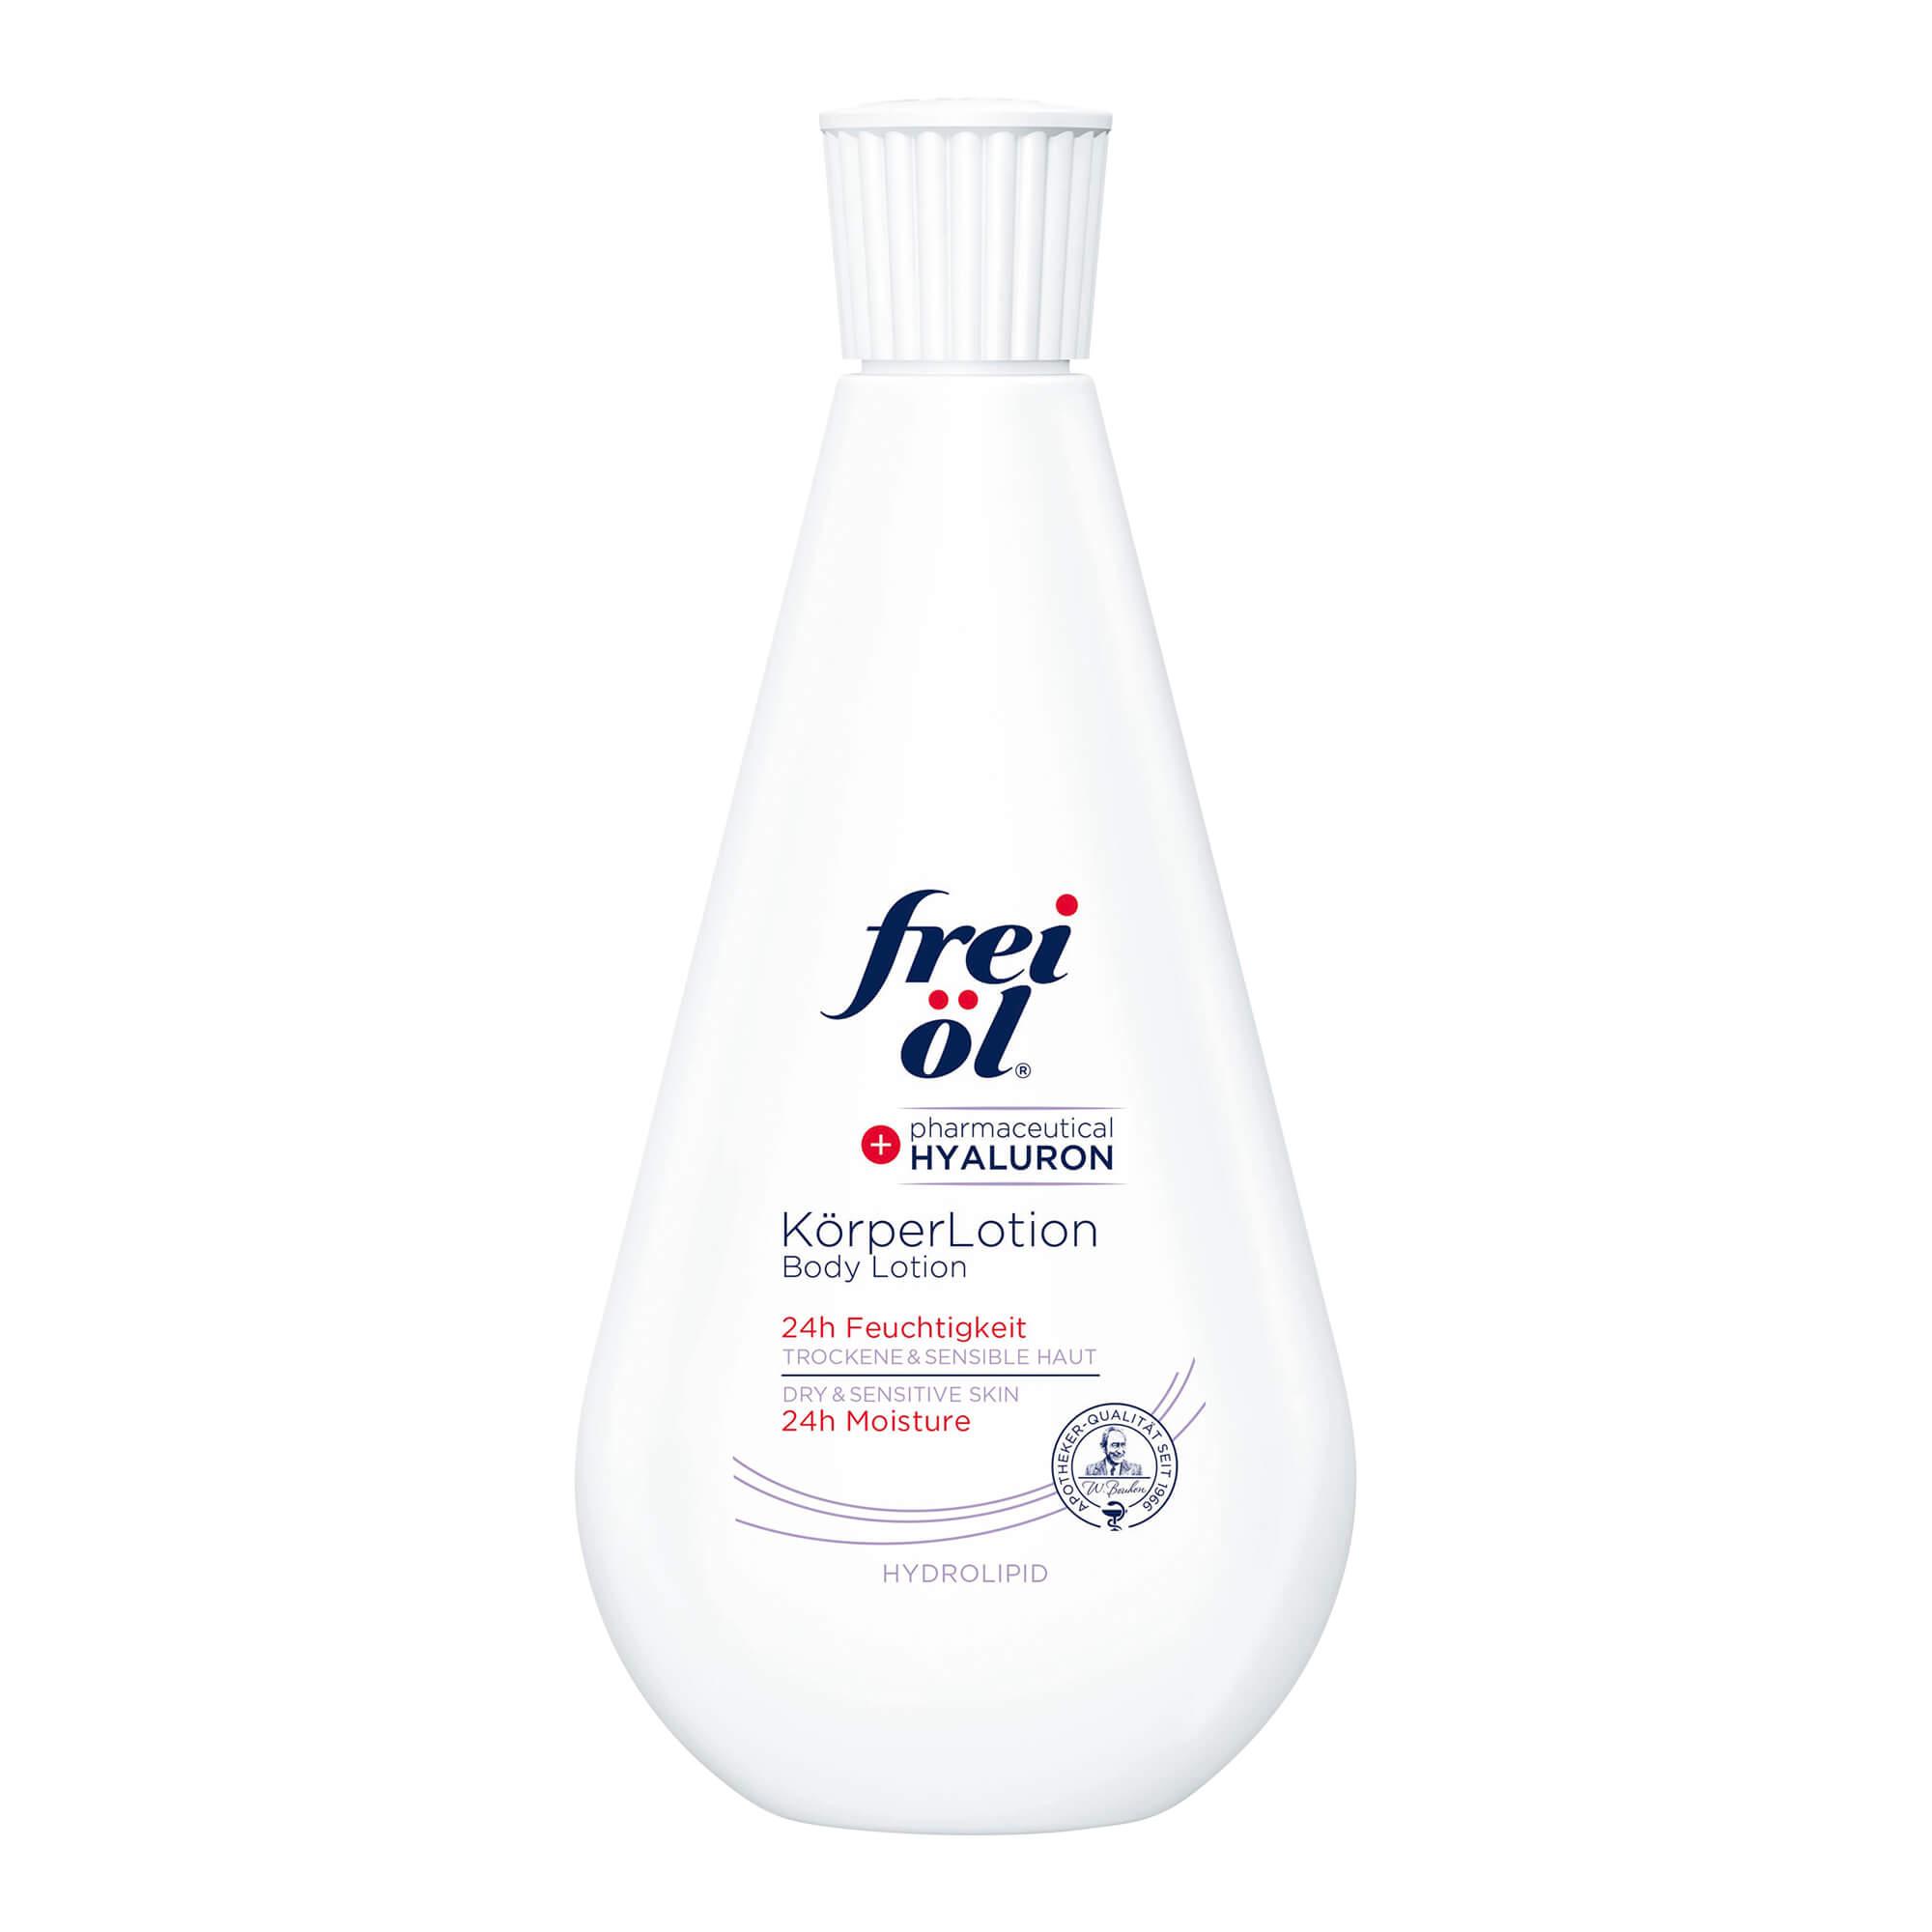 Frei Öl Hydrolipid KörperLotion